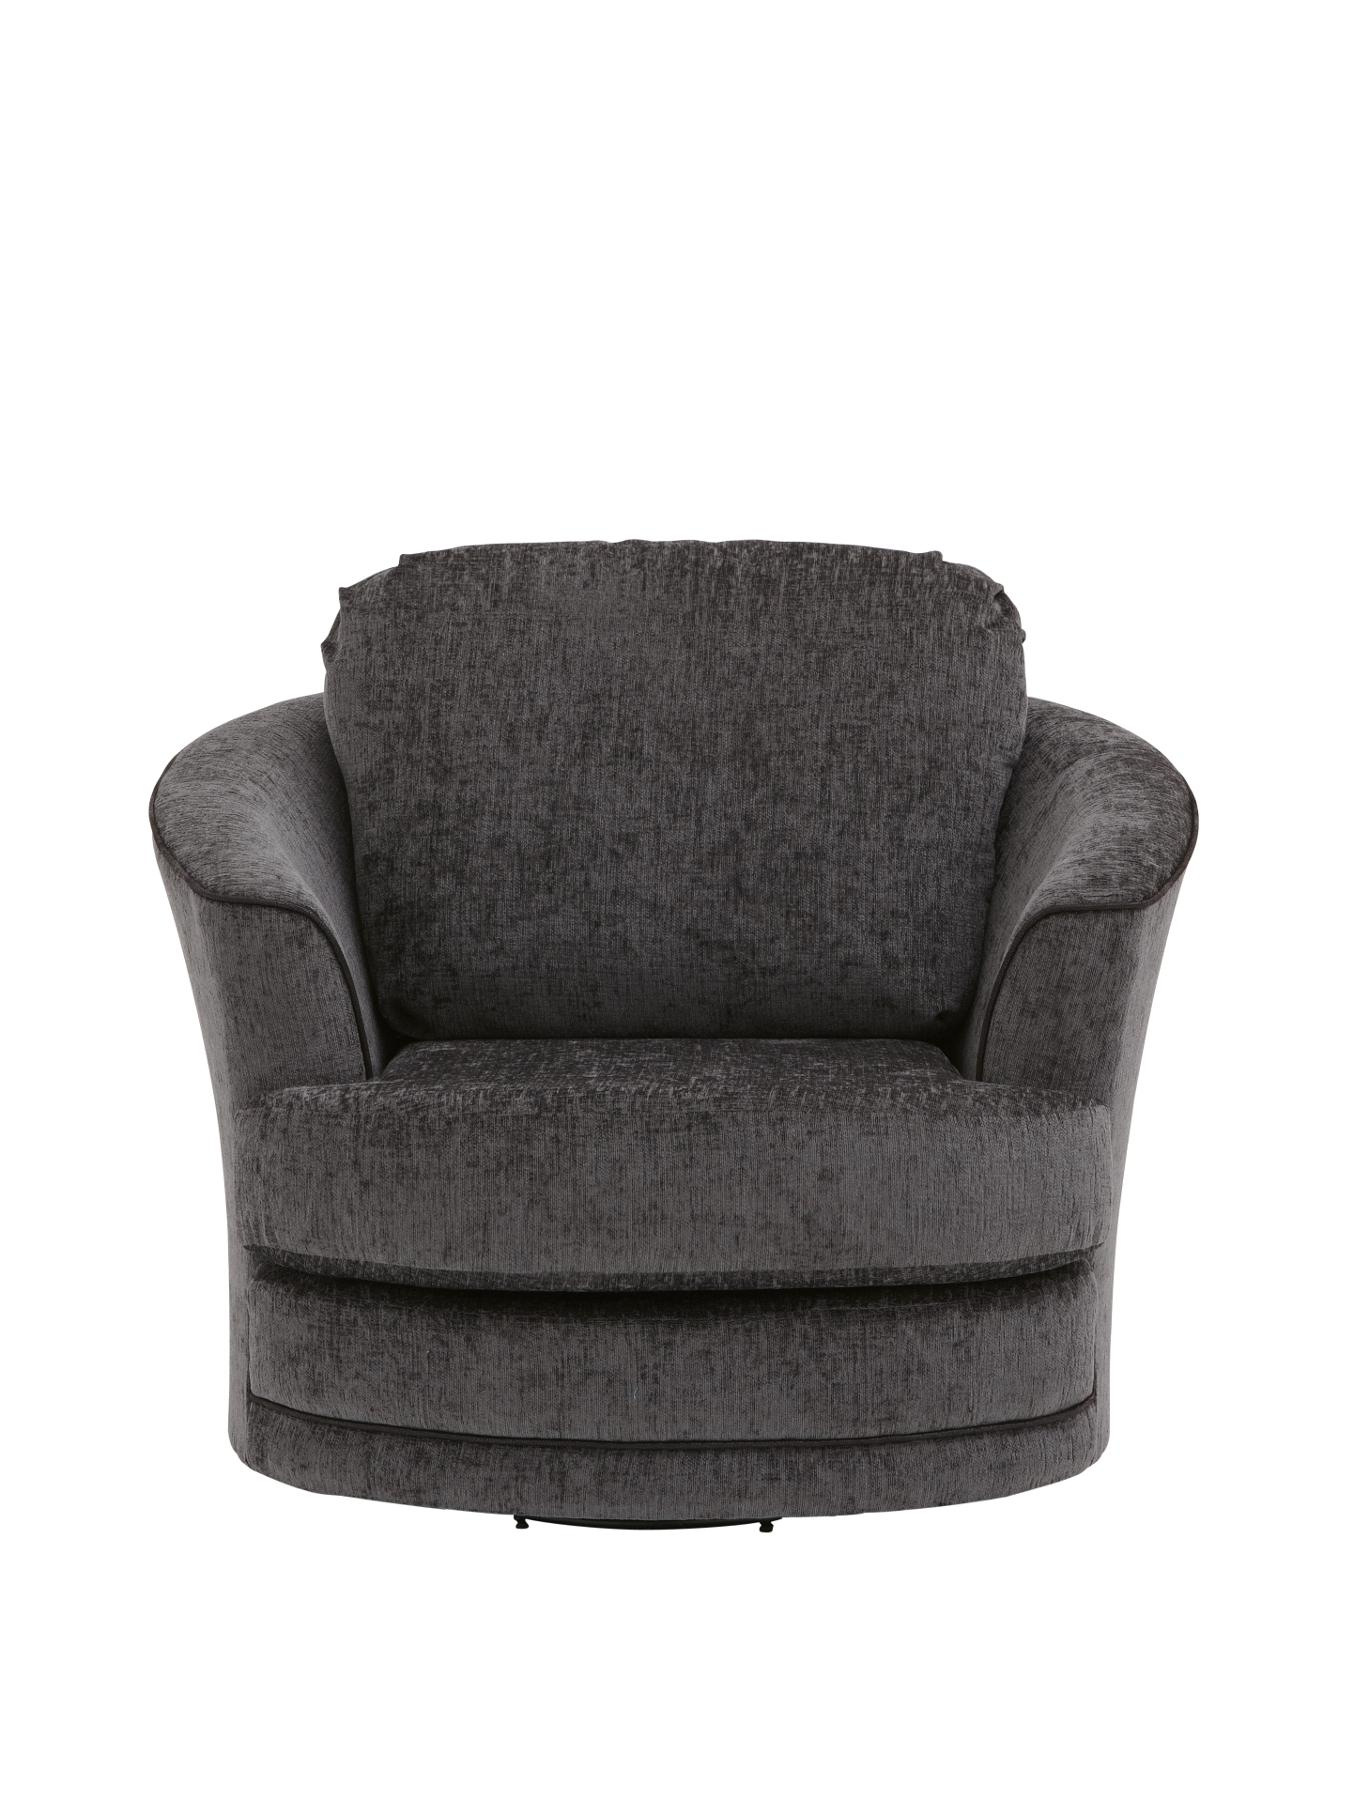 Unique Loco Small Swivel Armchair, Grey/black,chocolate/mink | Linkfish small swivel armchair